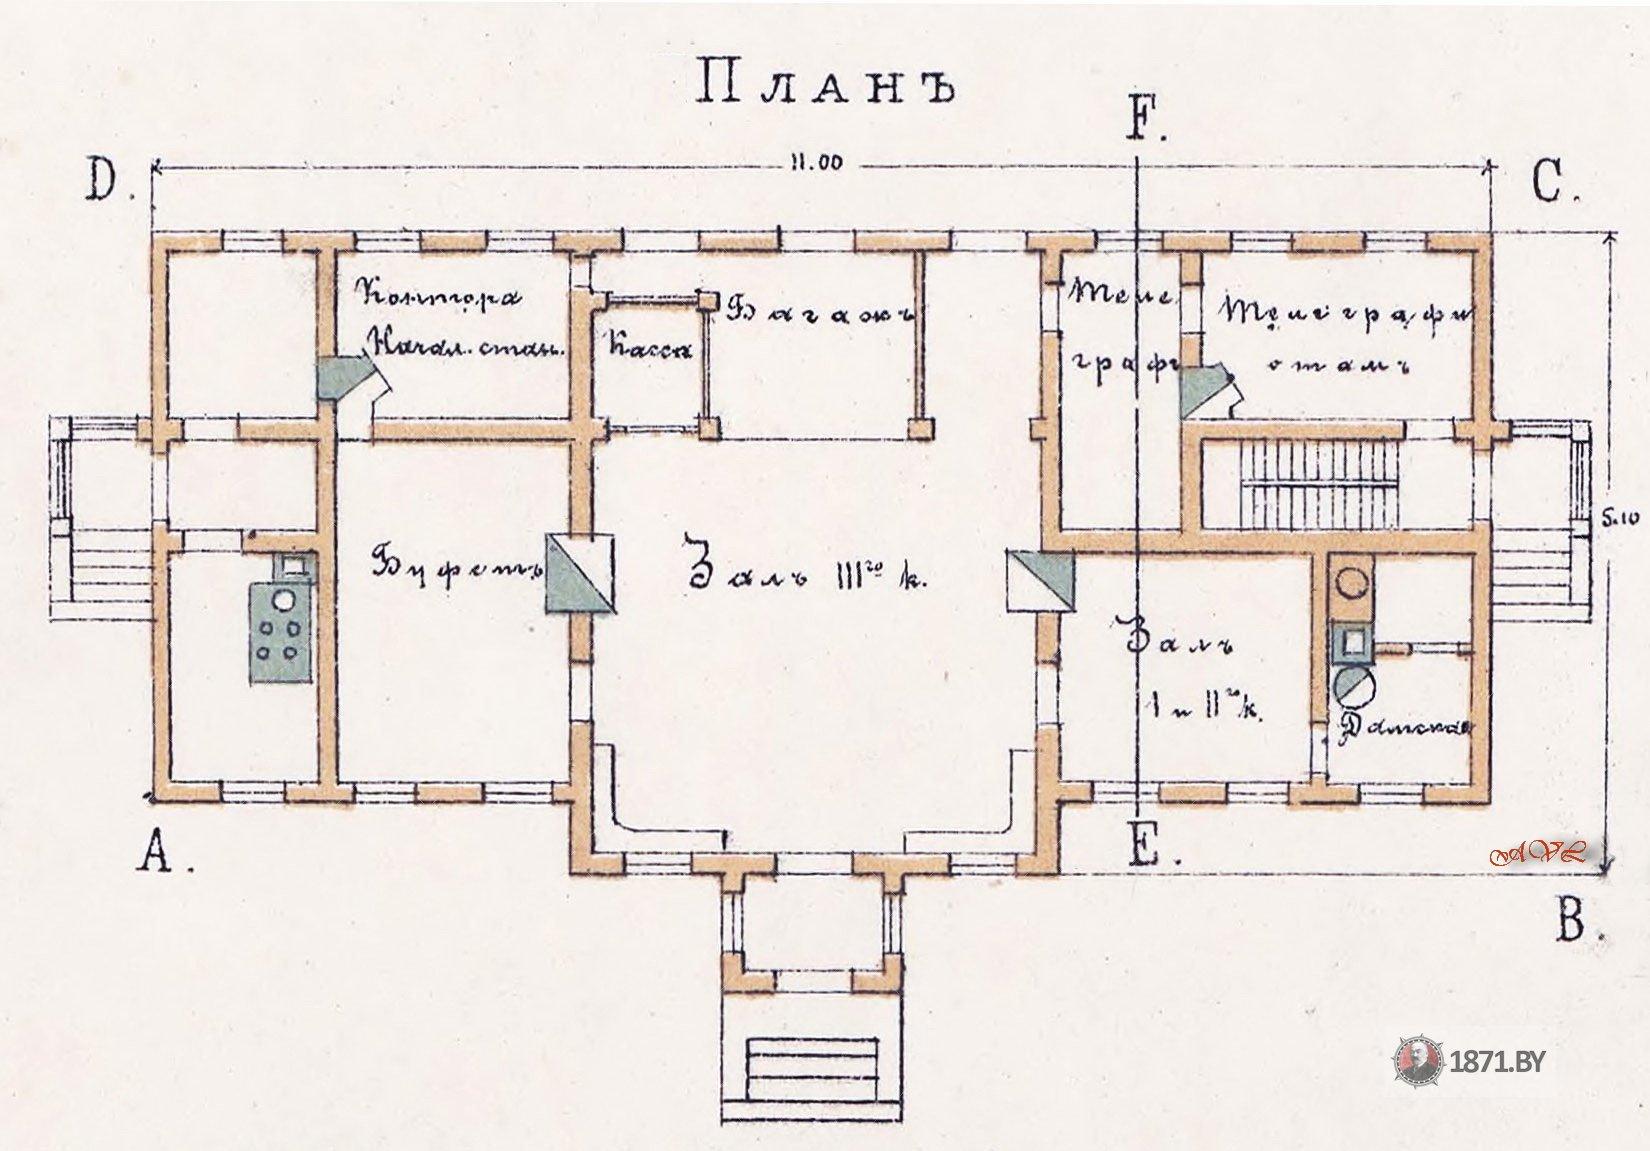 Пассажирское здание III-класса. План L